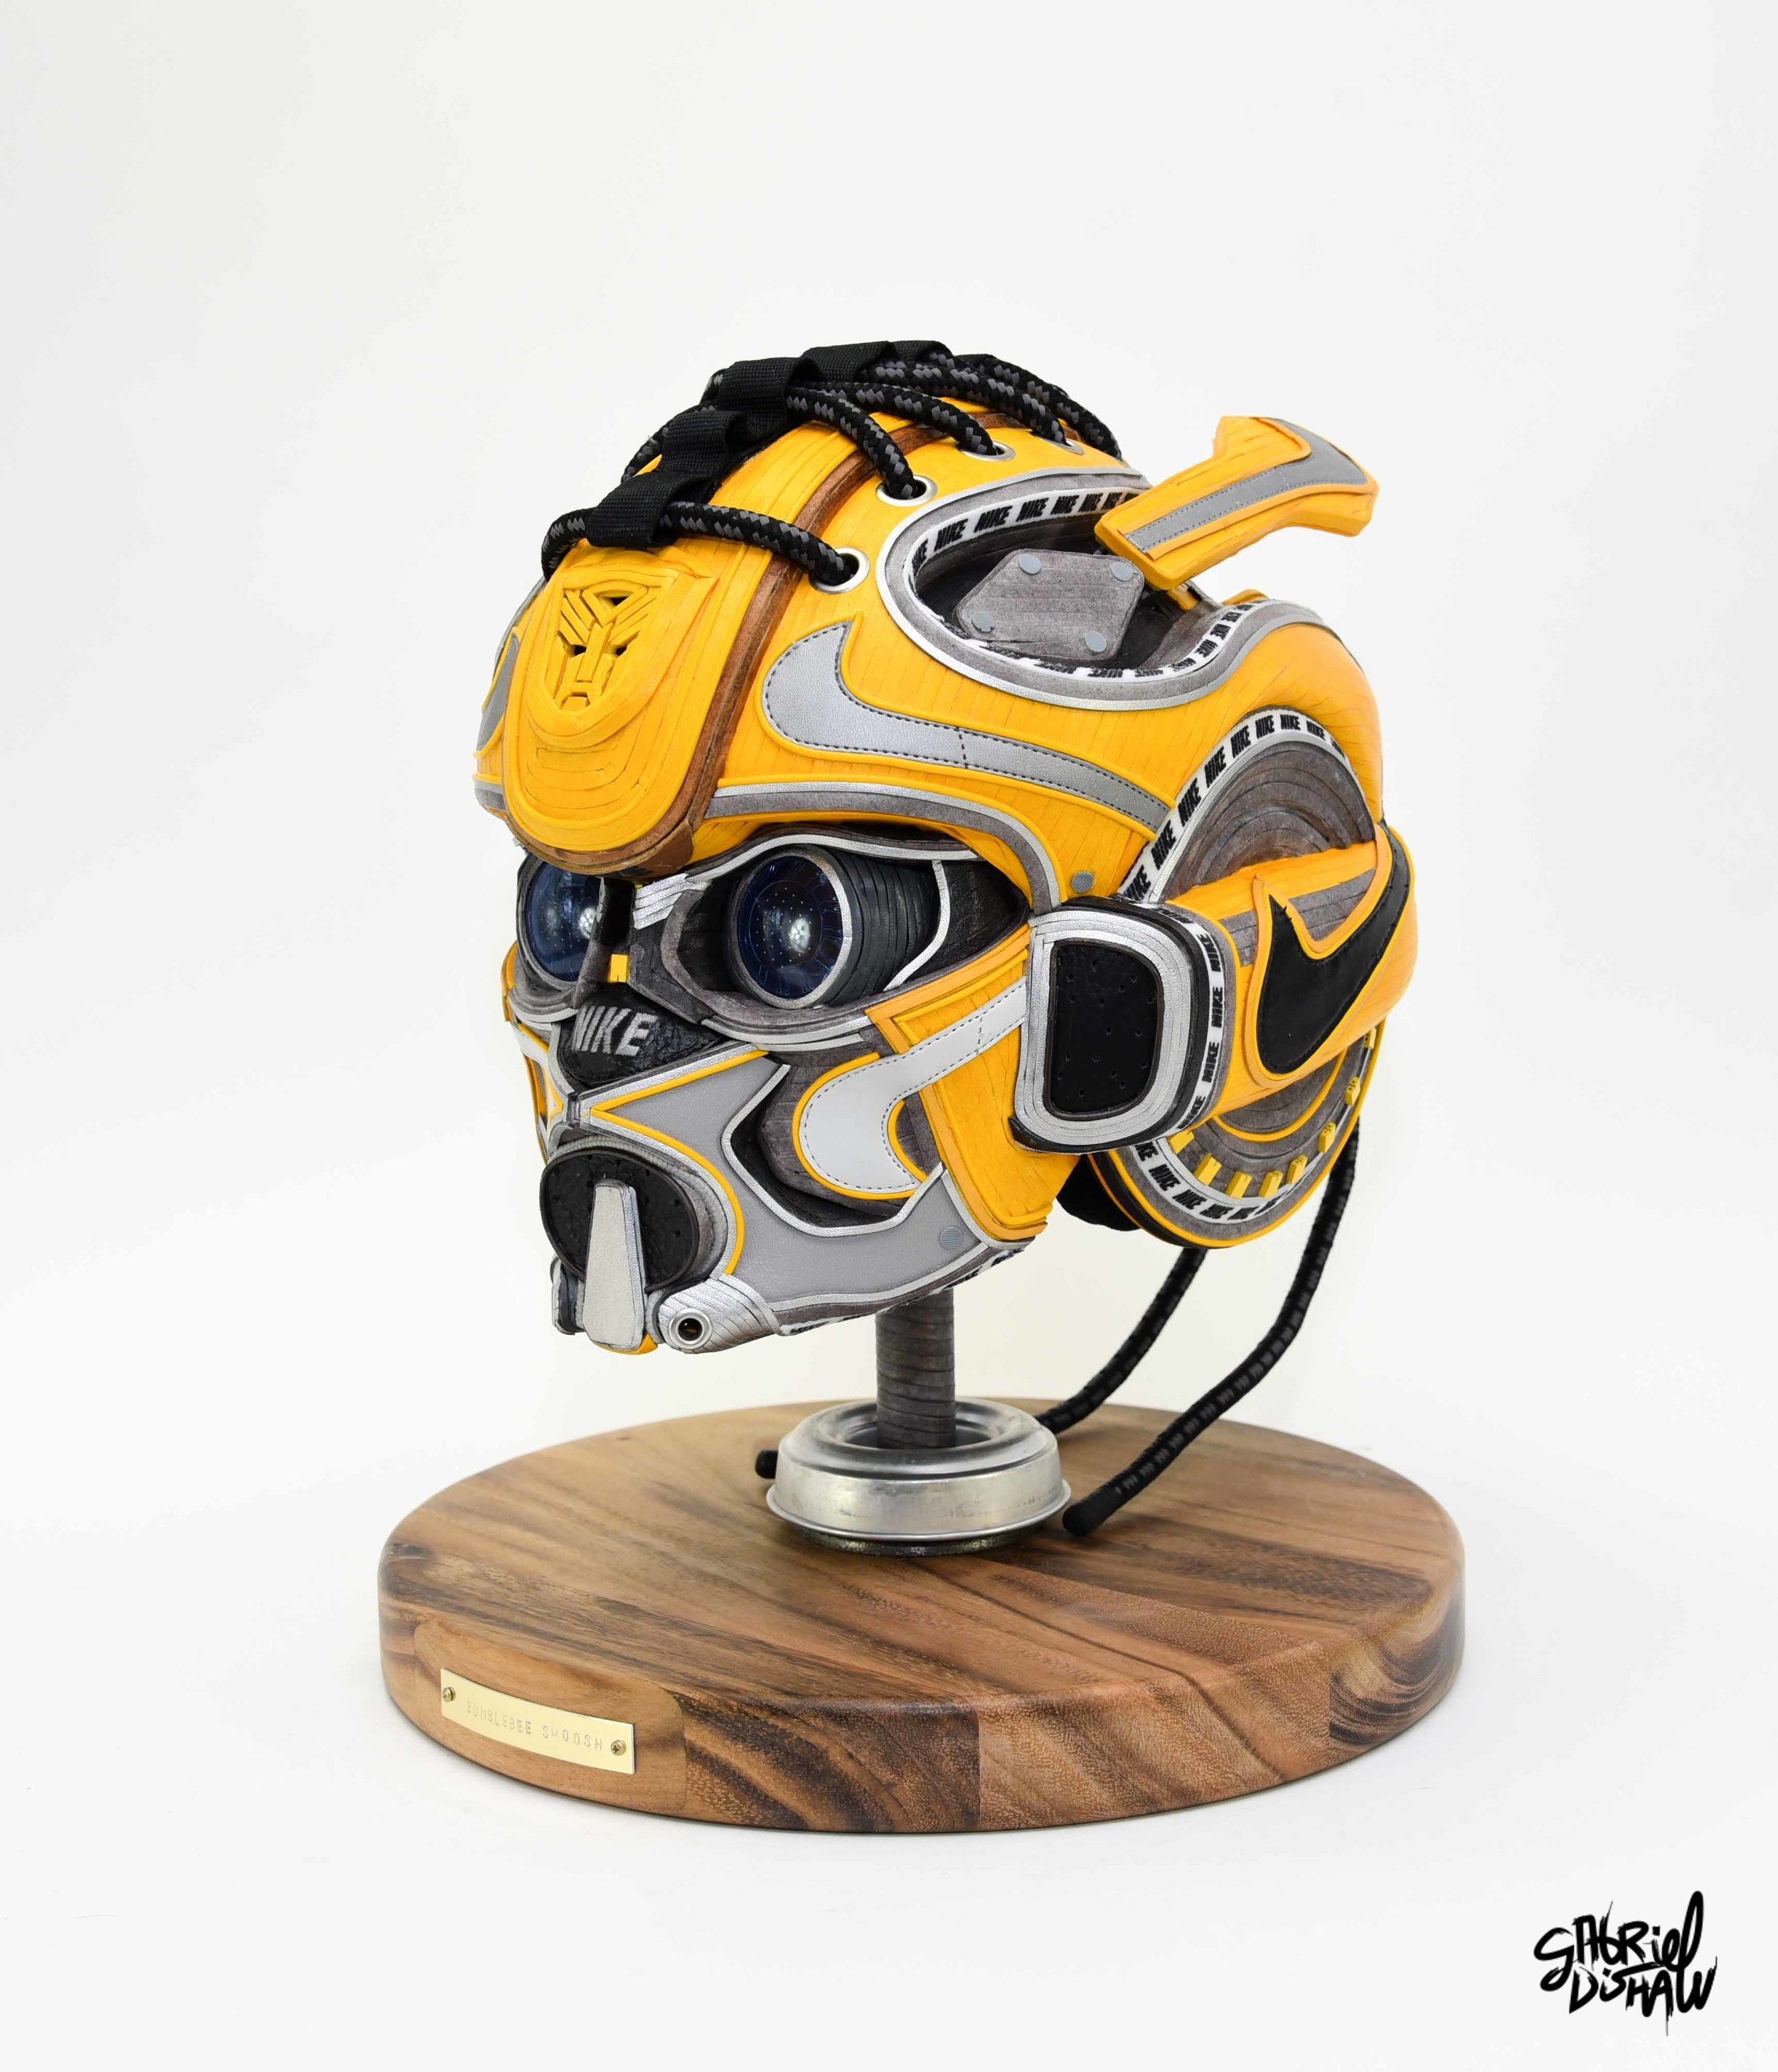 Gabriel Dishaw Bumblebee Swoosh-8606.jpg